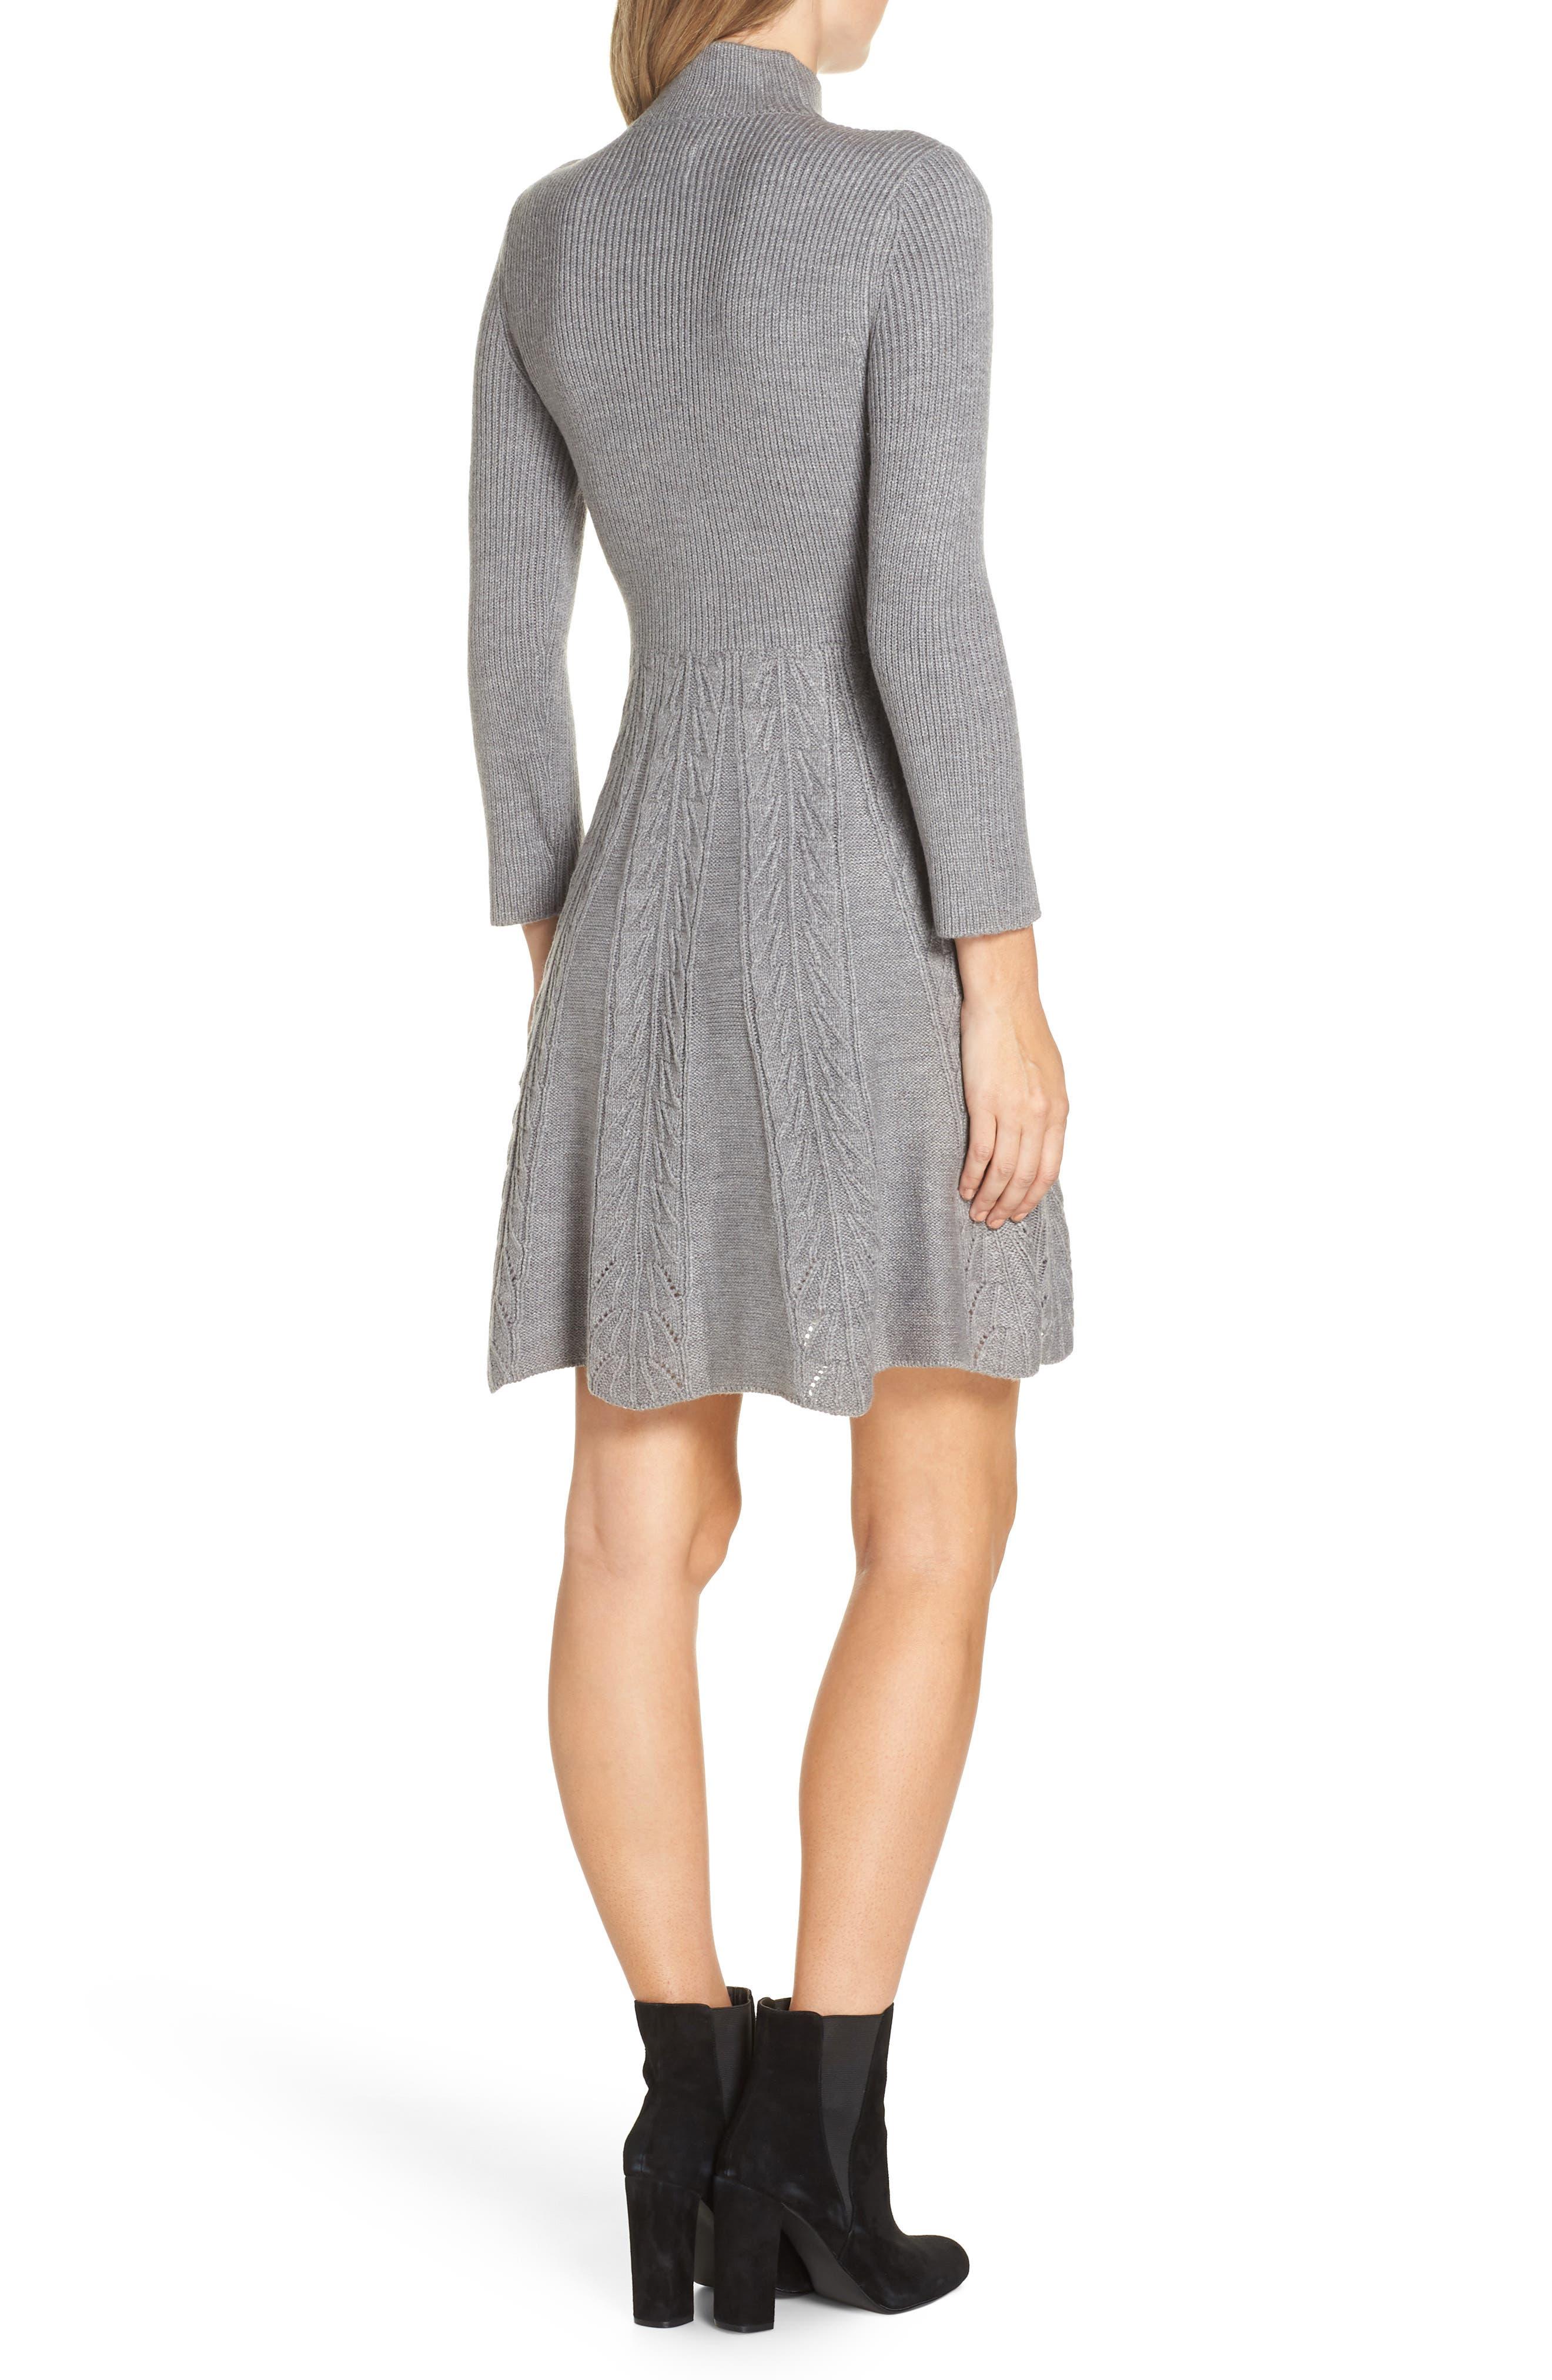 ELIZA J, Mock Neck Fit & Flare Sweater Dress, Alternate thumbnail 2, color, 030